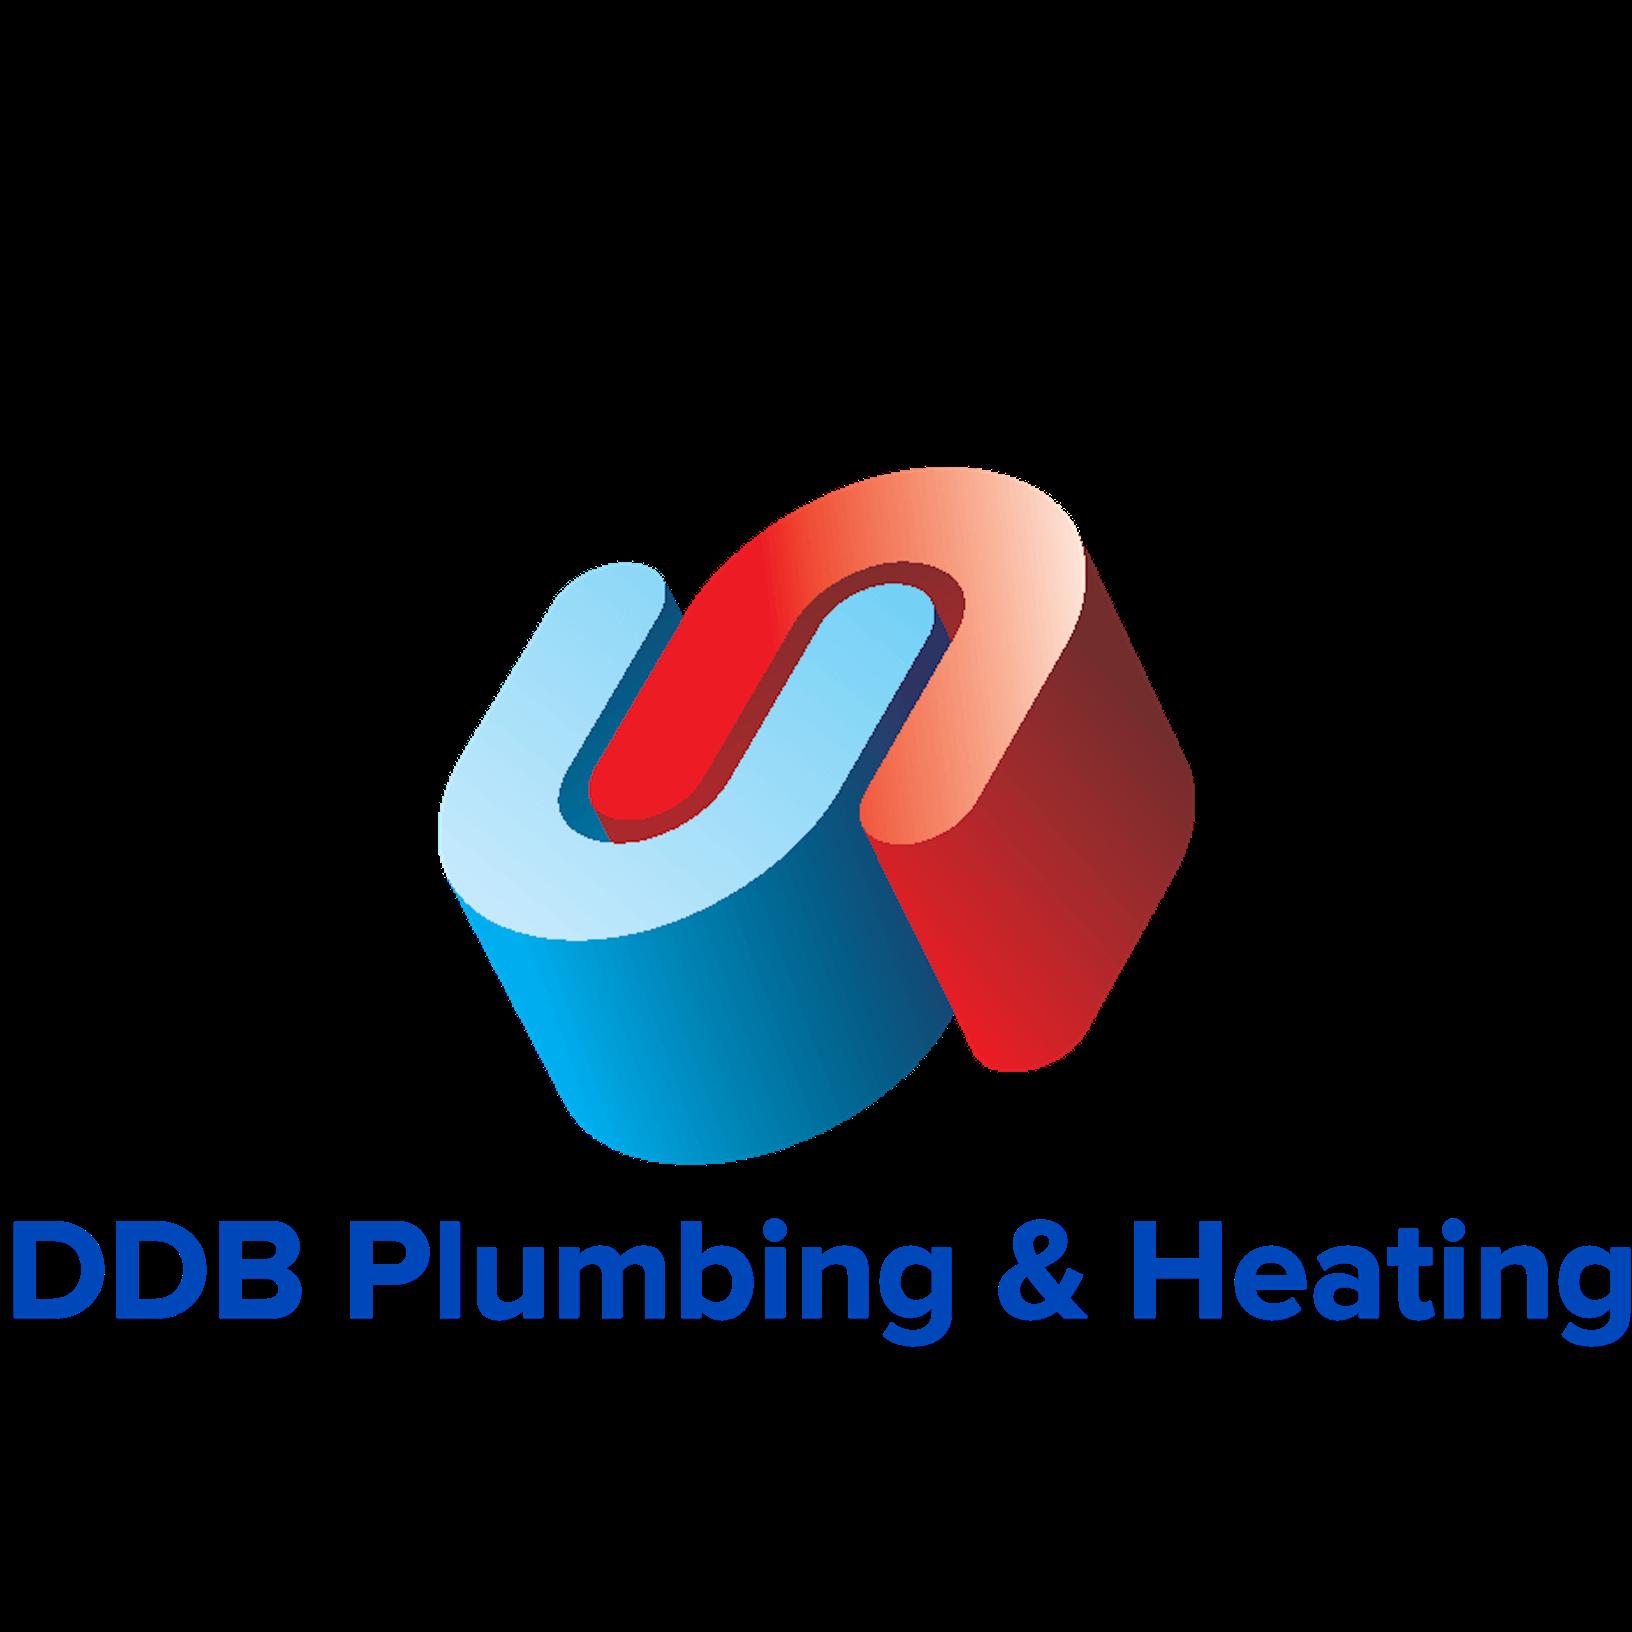 DDB Plumbing & Heating